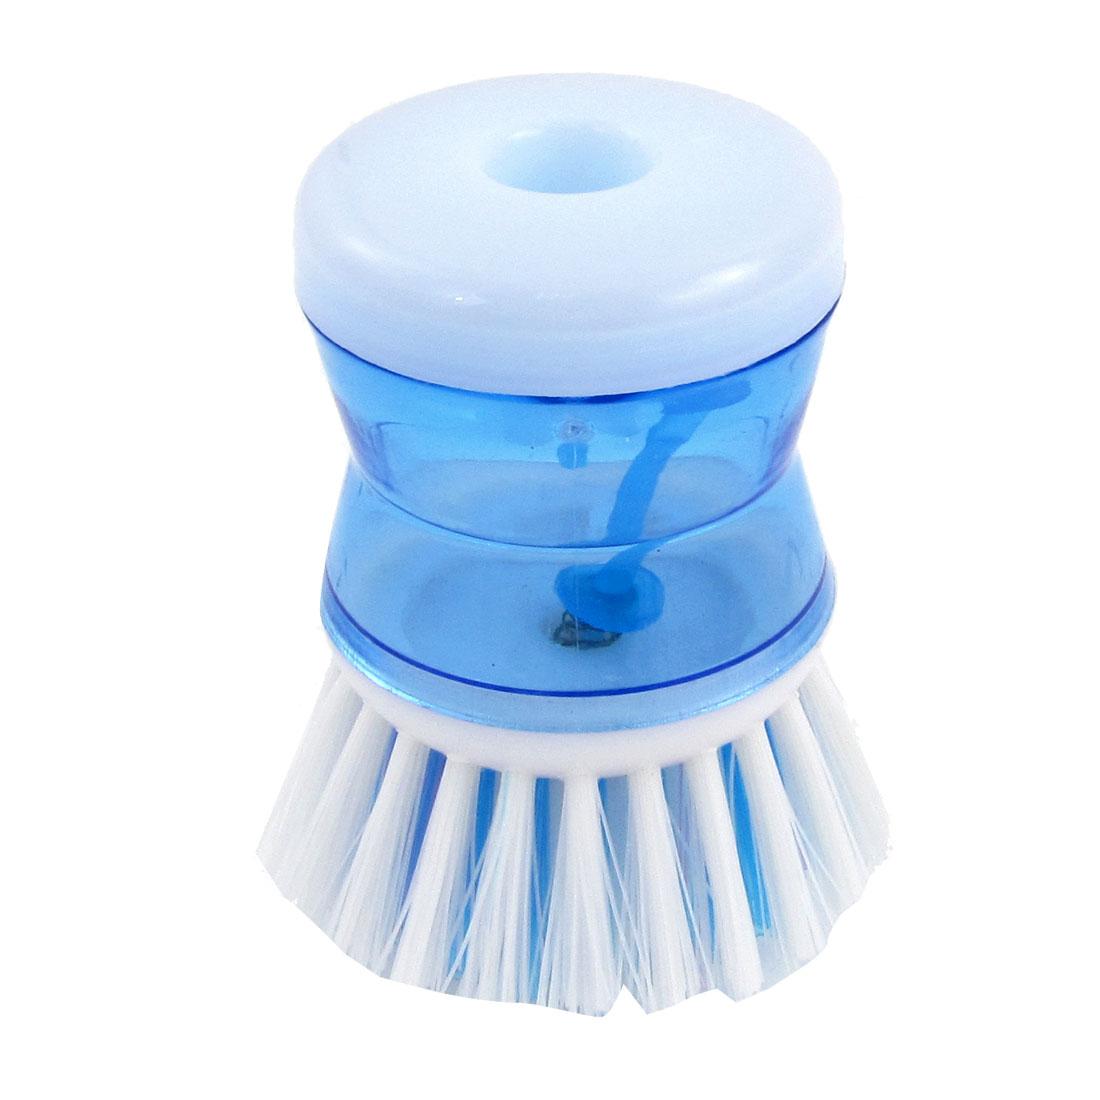 Pot Pan Wok Bowl Cleaning Tool Plastic Scrubber Brush Blue White